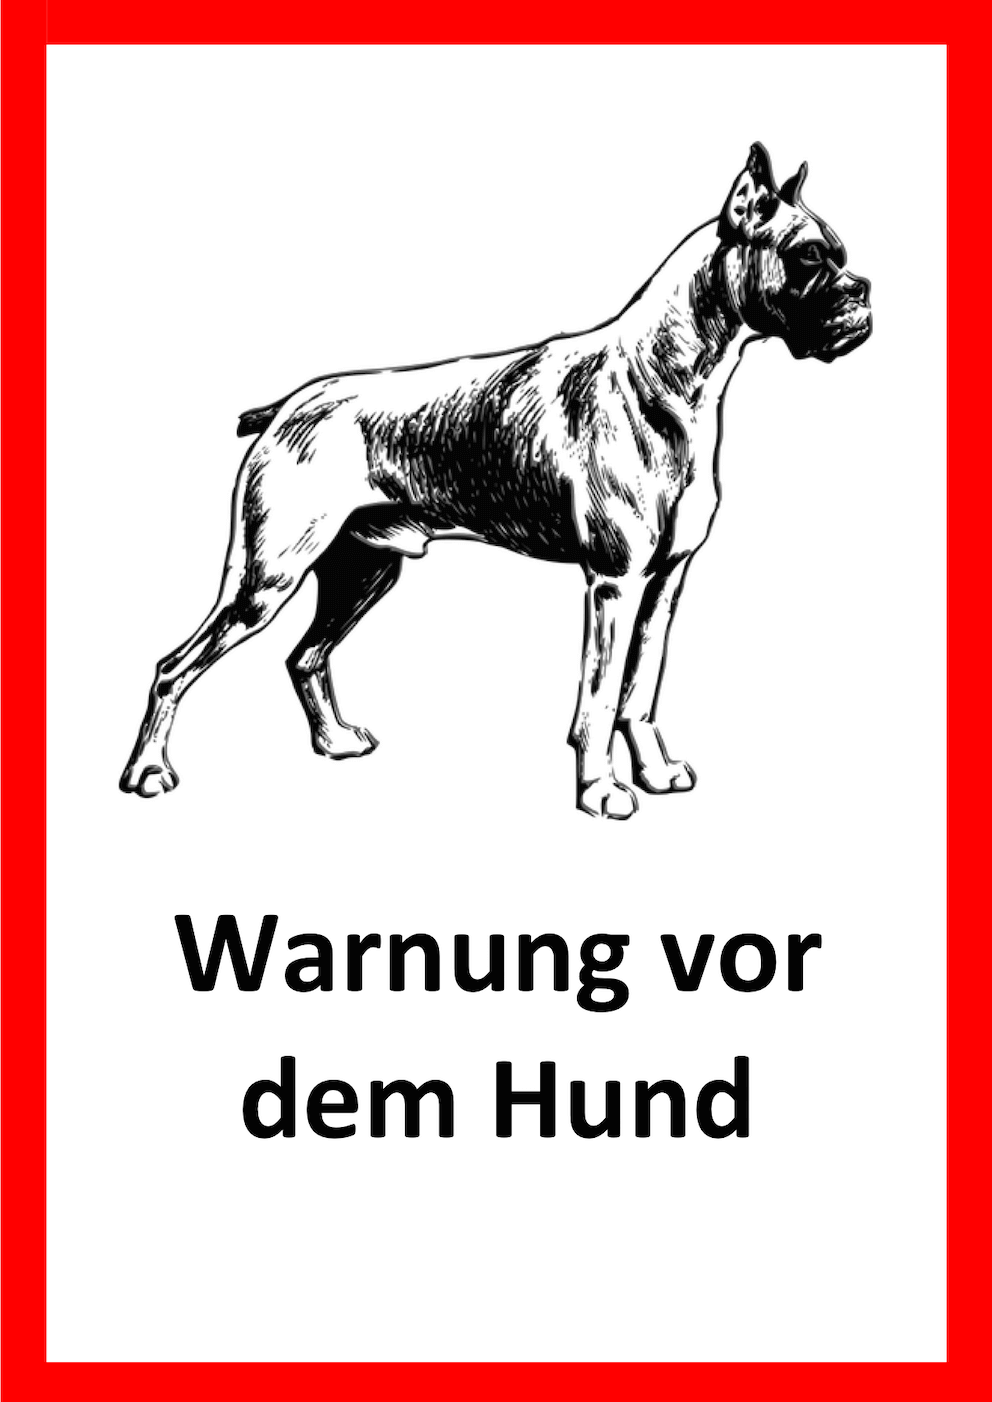 Warnung vor dem Hunde Schild Vorlage 1